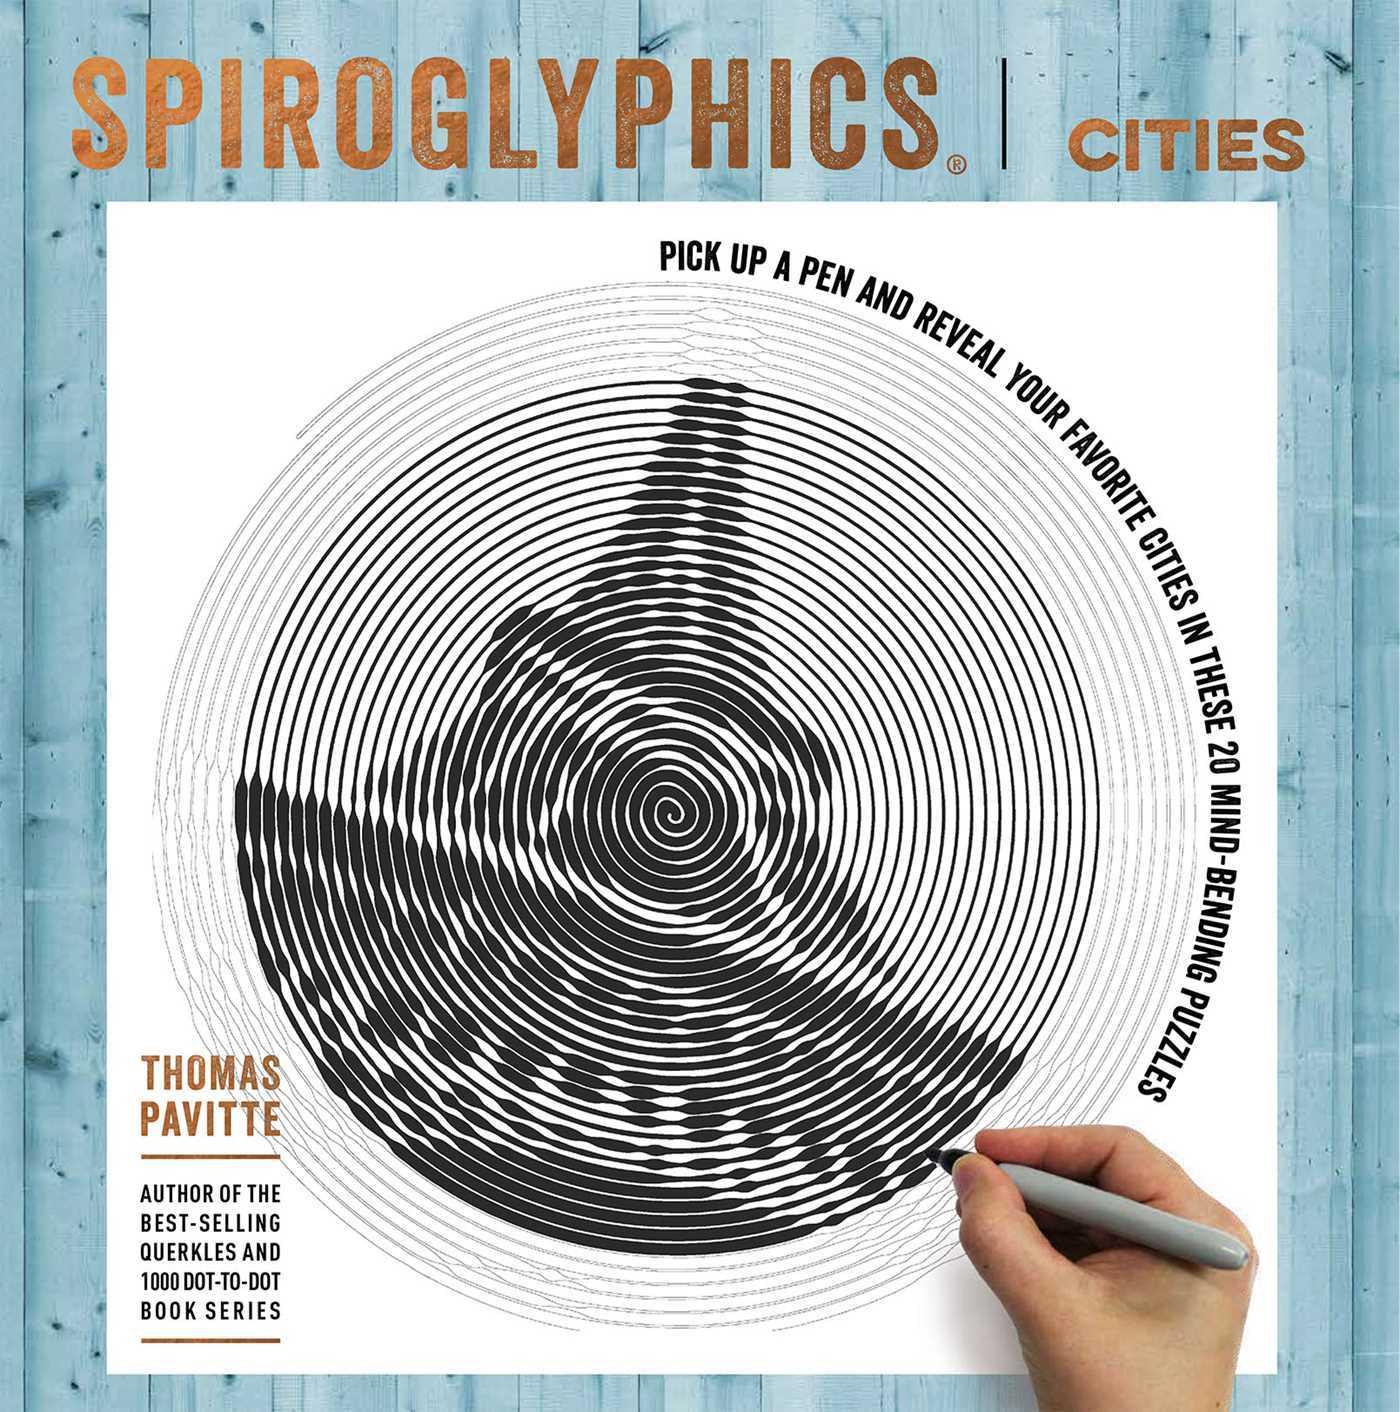 Spiroglyphics: Cities